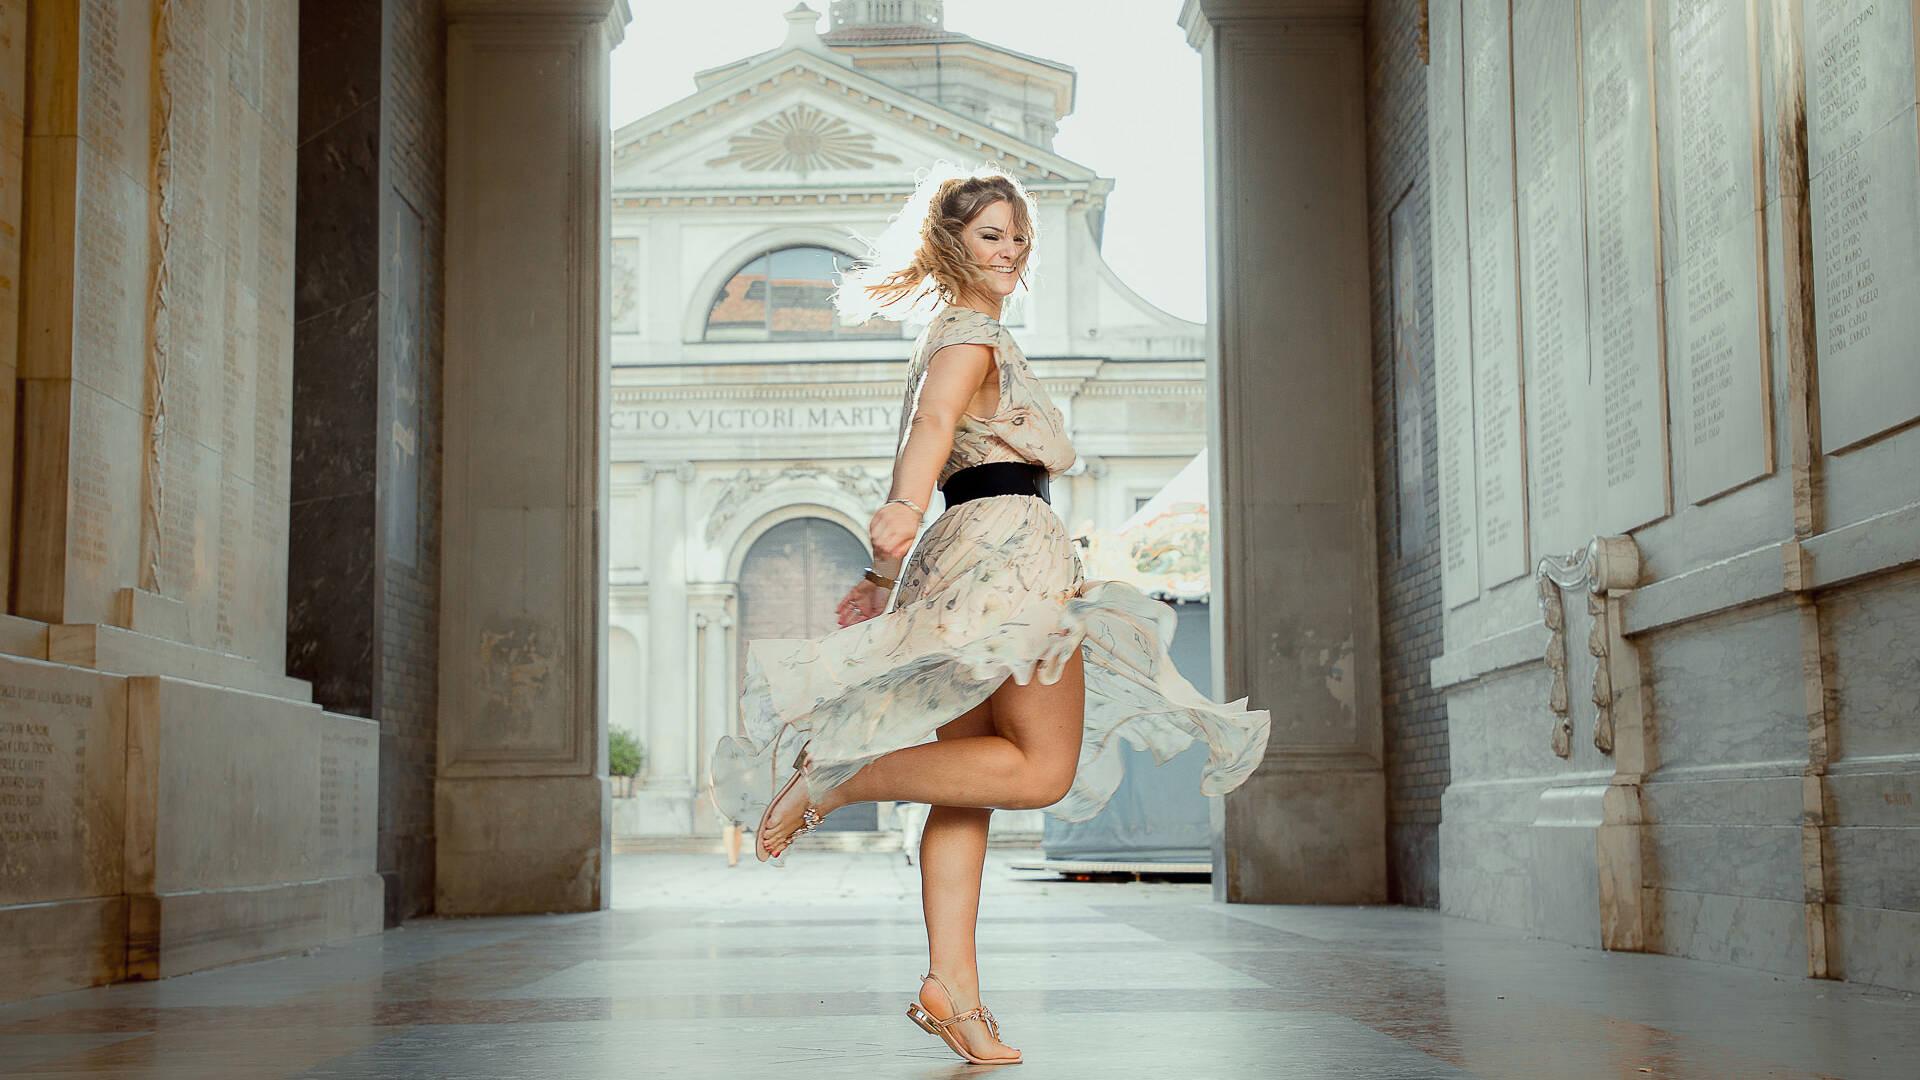 Irene Bianchi Pinotti de Itália